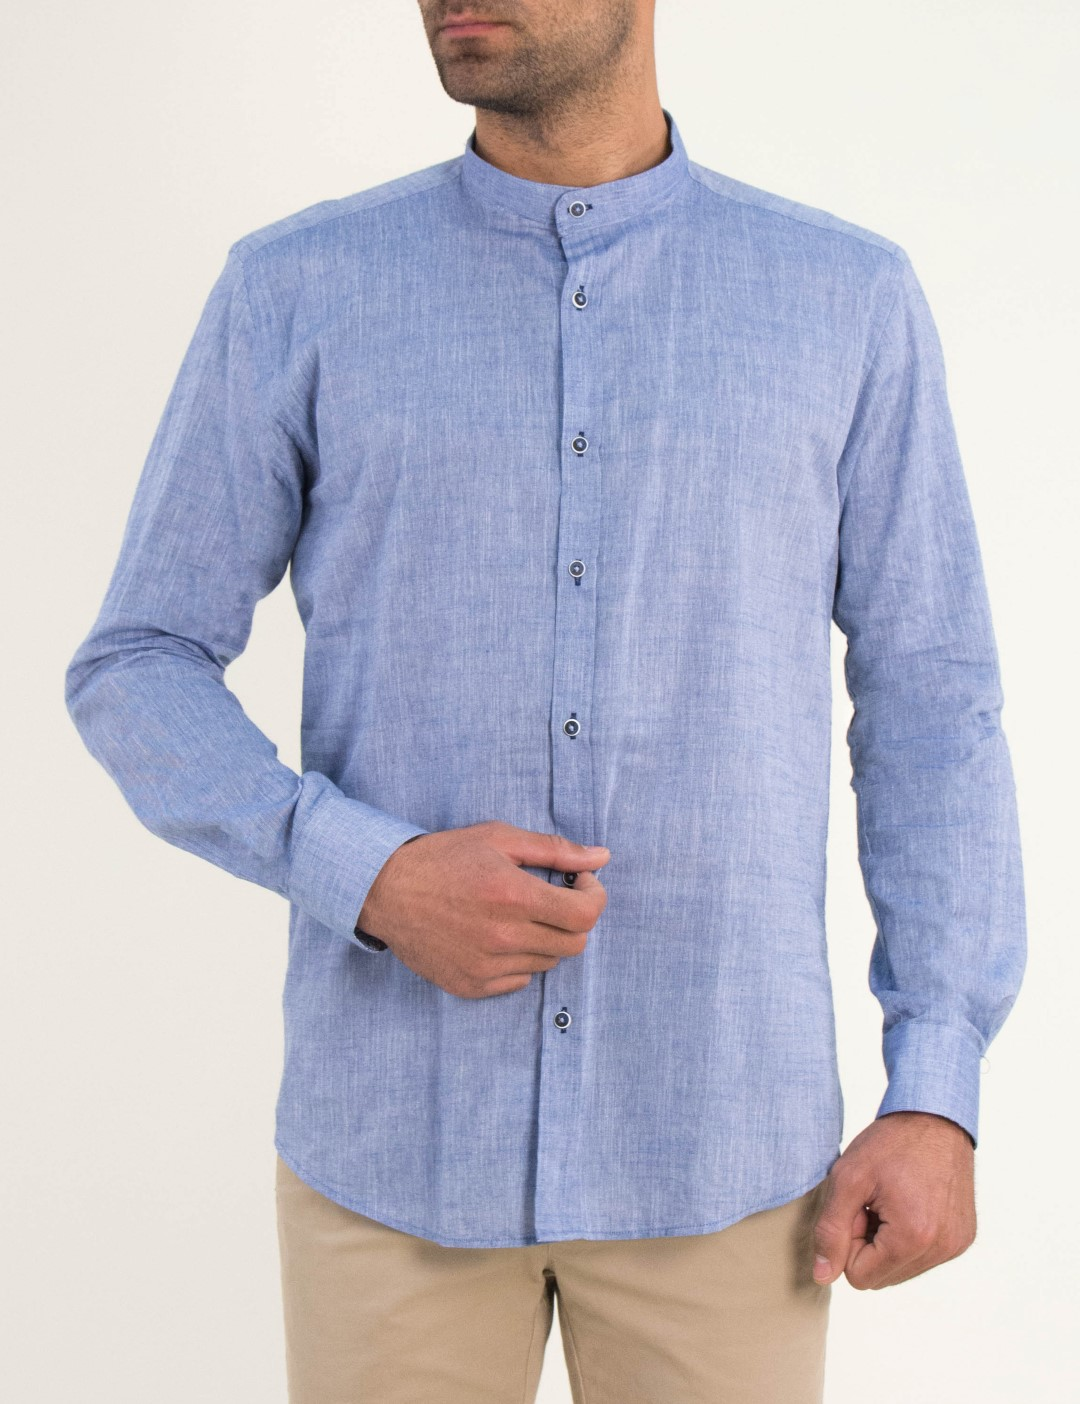 4430614d33fe Ανδρικό σιελ πουκάμισο μαο γιακά Firenze 0195110